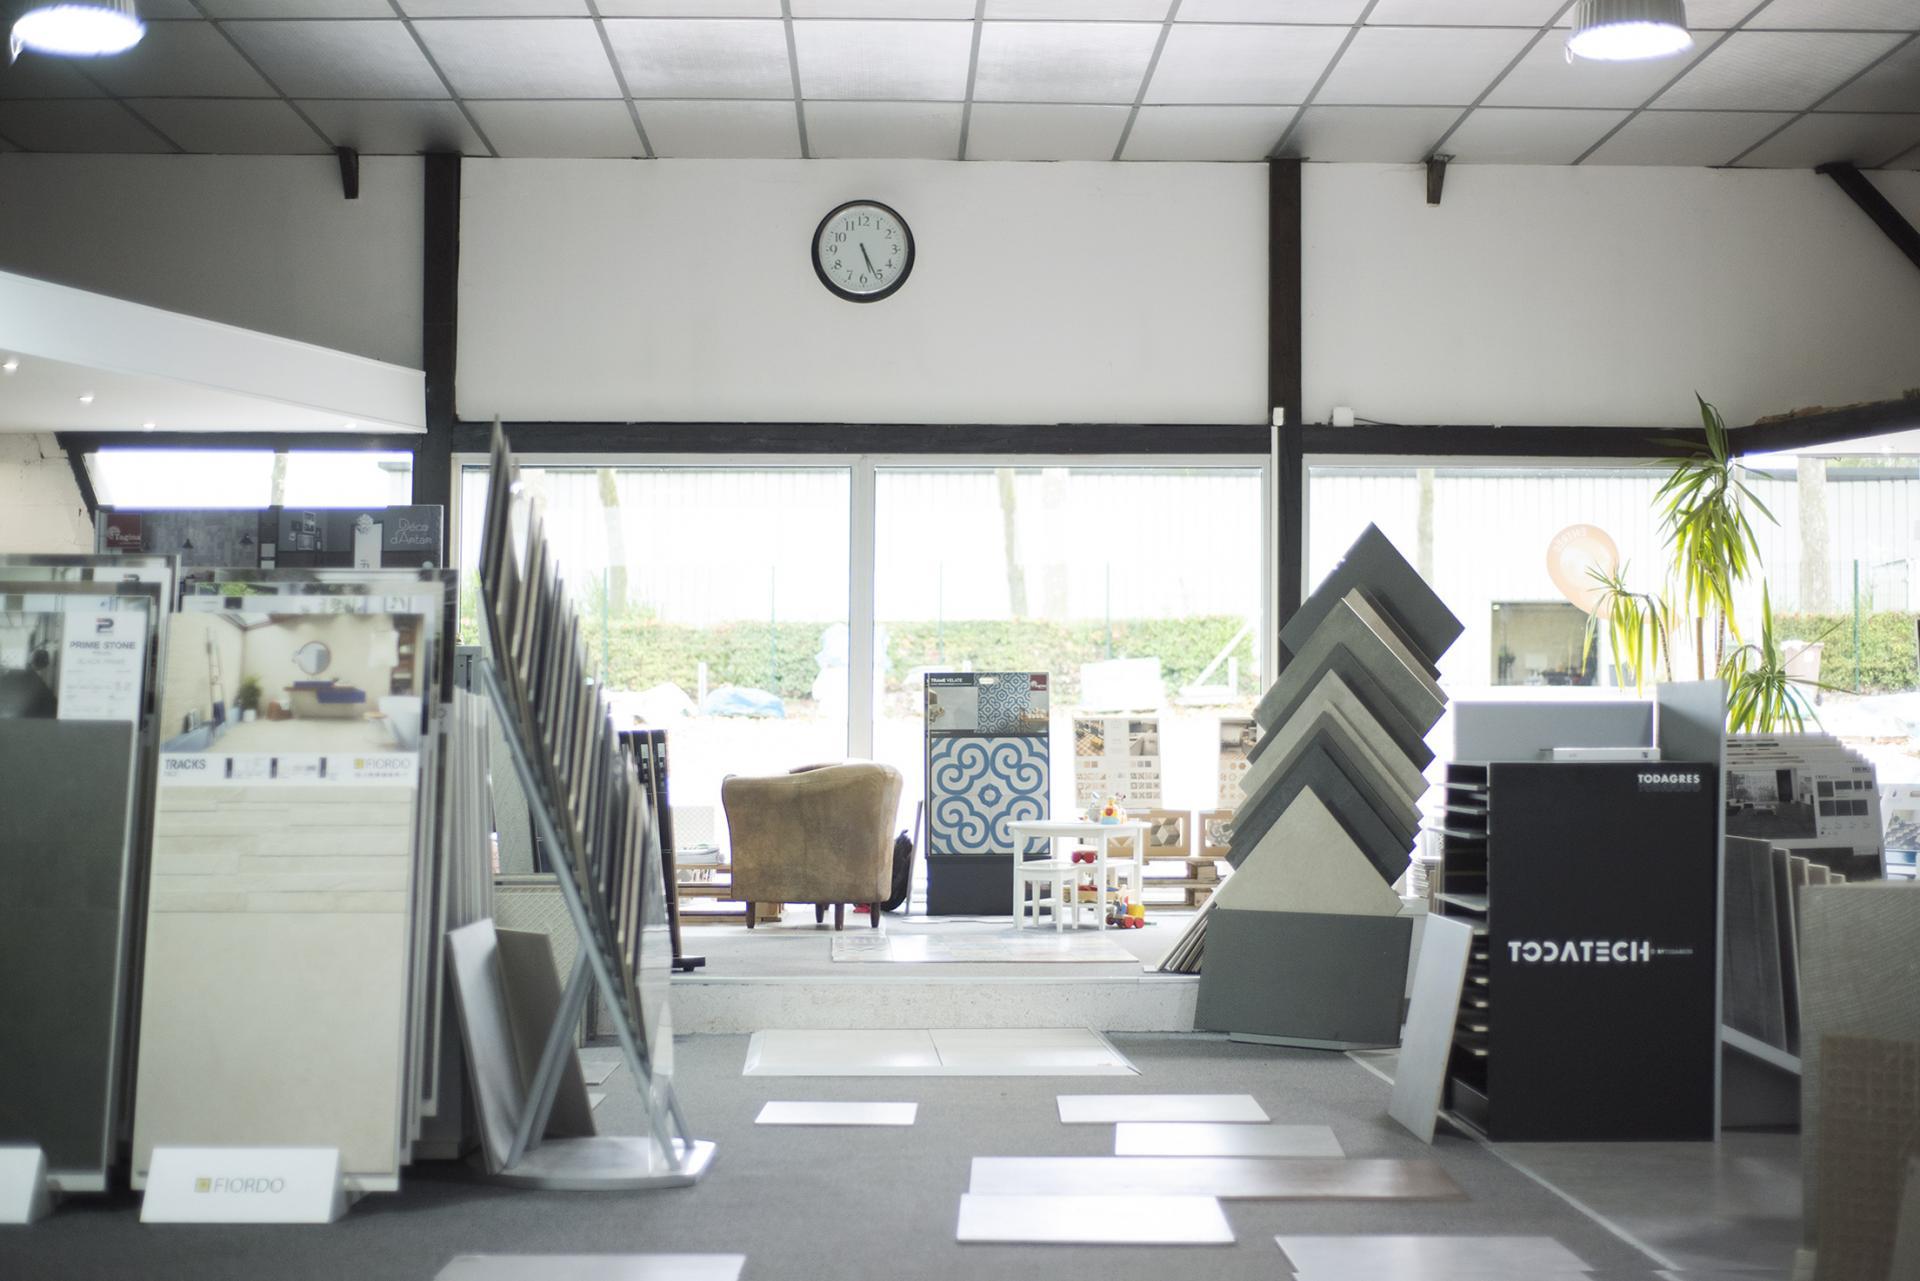 magasin de carrelage amiens en picardie vente de carrelages. Black Bedroom Furniture Sets. Home Design Ideas